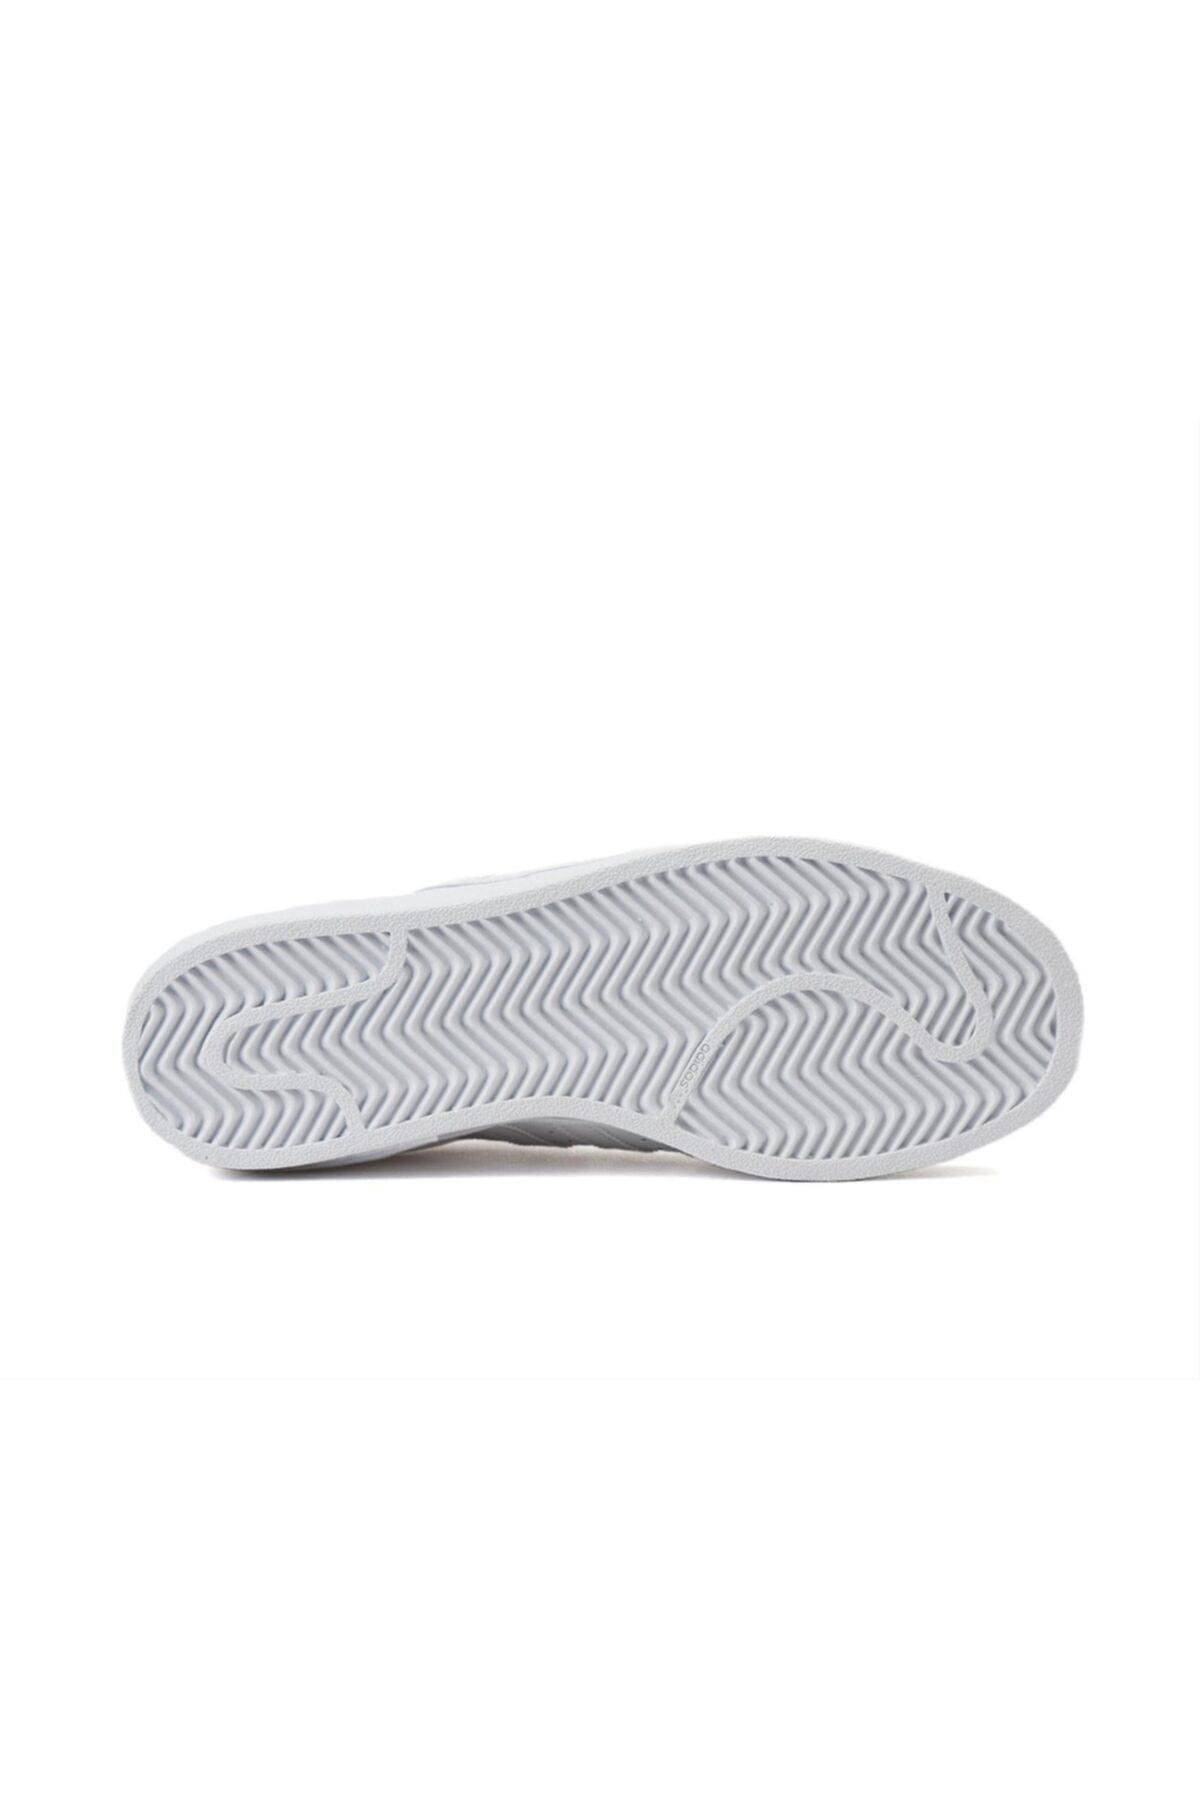 adidas Superstar Foundation Erkek Beyaz Sneaker B27136 2